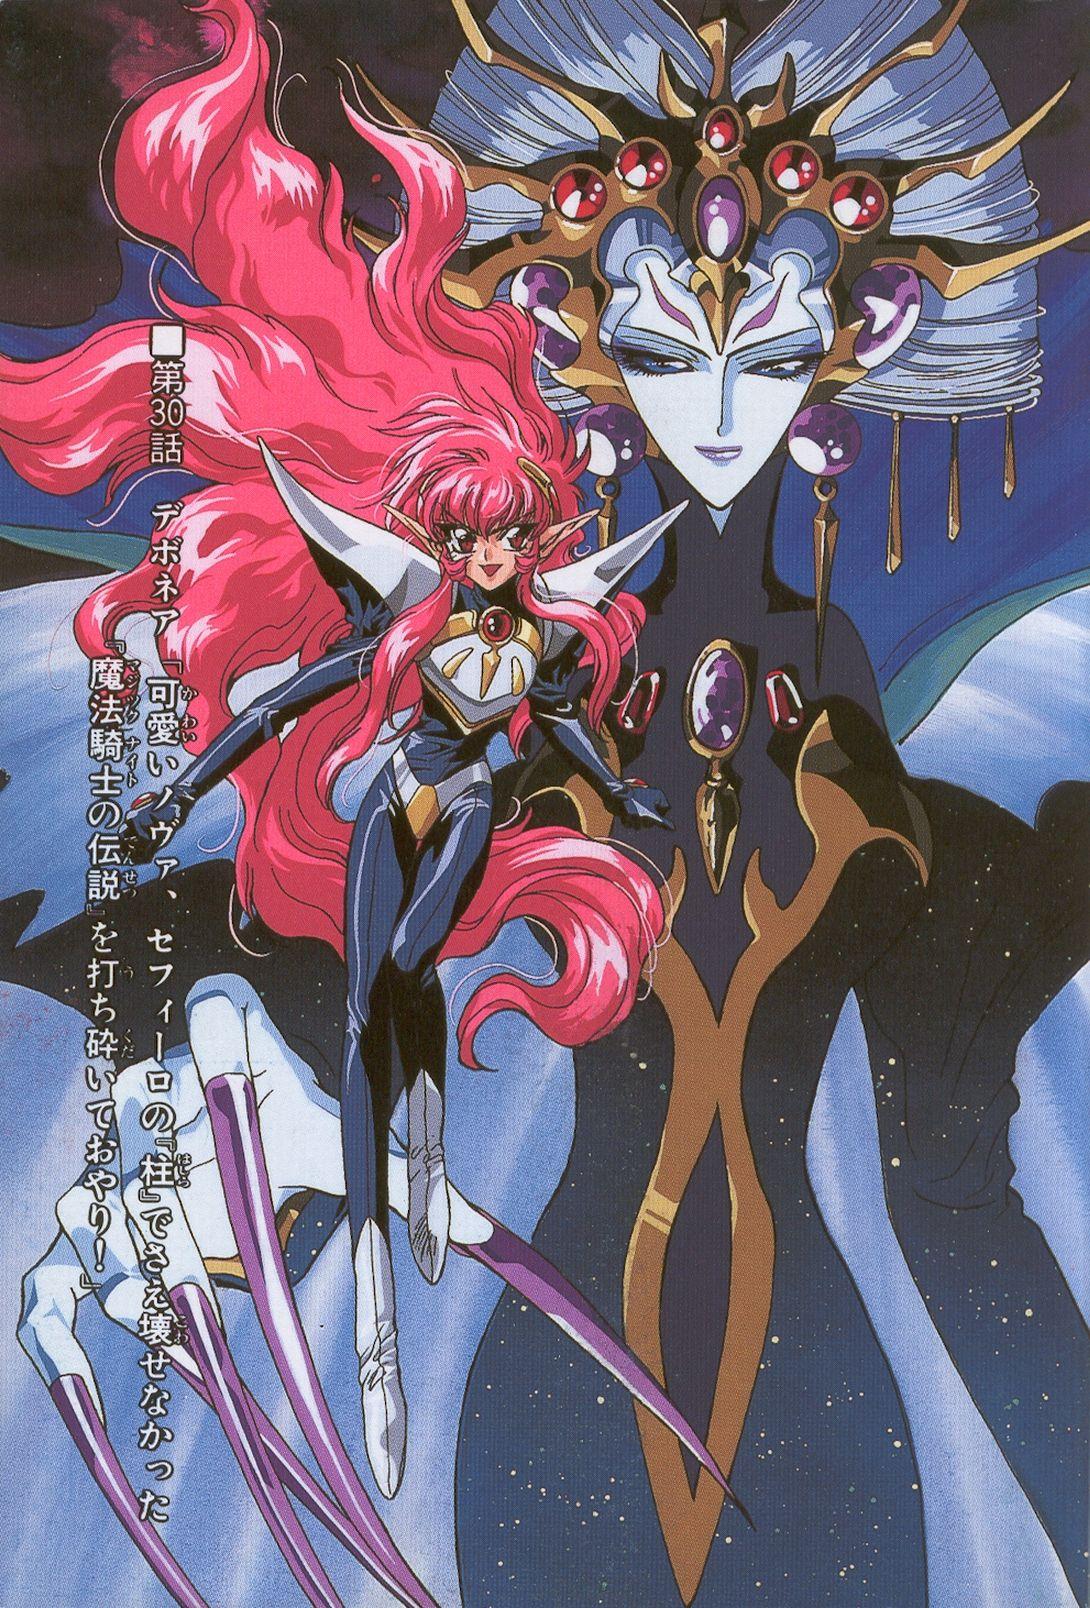 Magic Knight Rayearth CLAMP art manga Pinterest